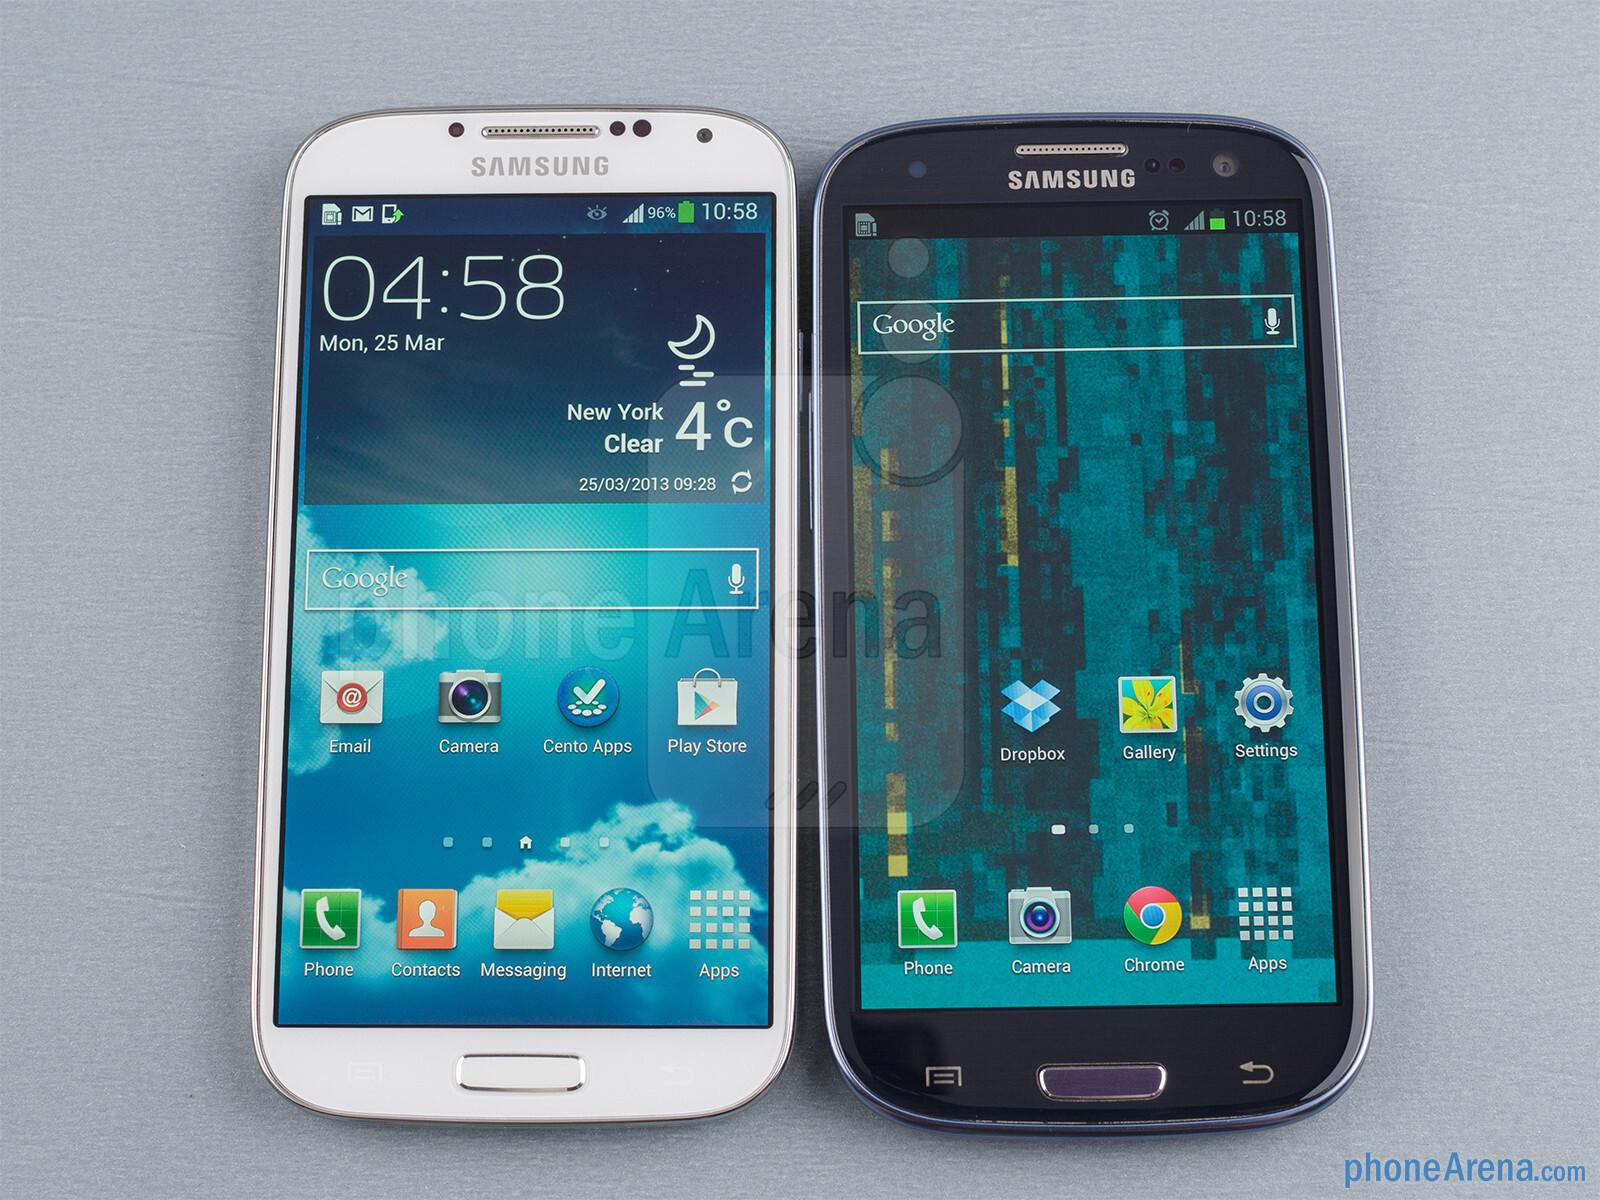 Samsung galaxy s4 vs samsung galaxy s iii the samsung galaxy s4 left and the samsung galaxy s iii right ccuart Gallery